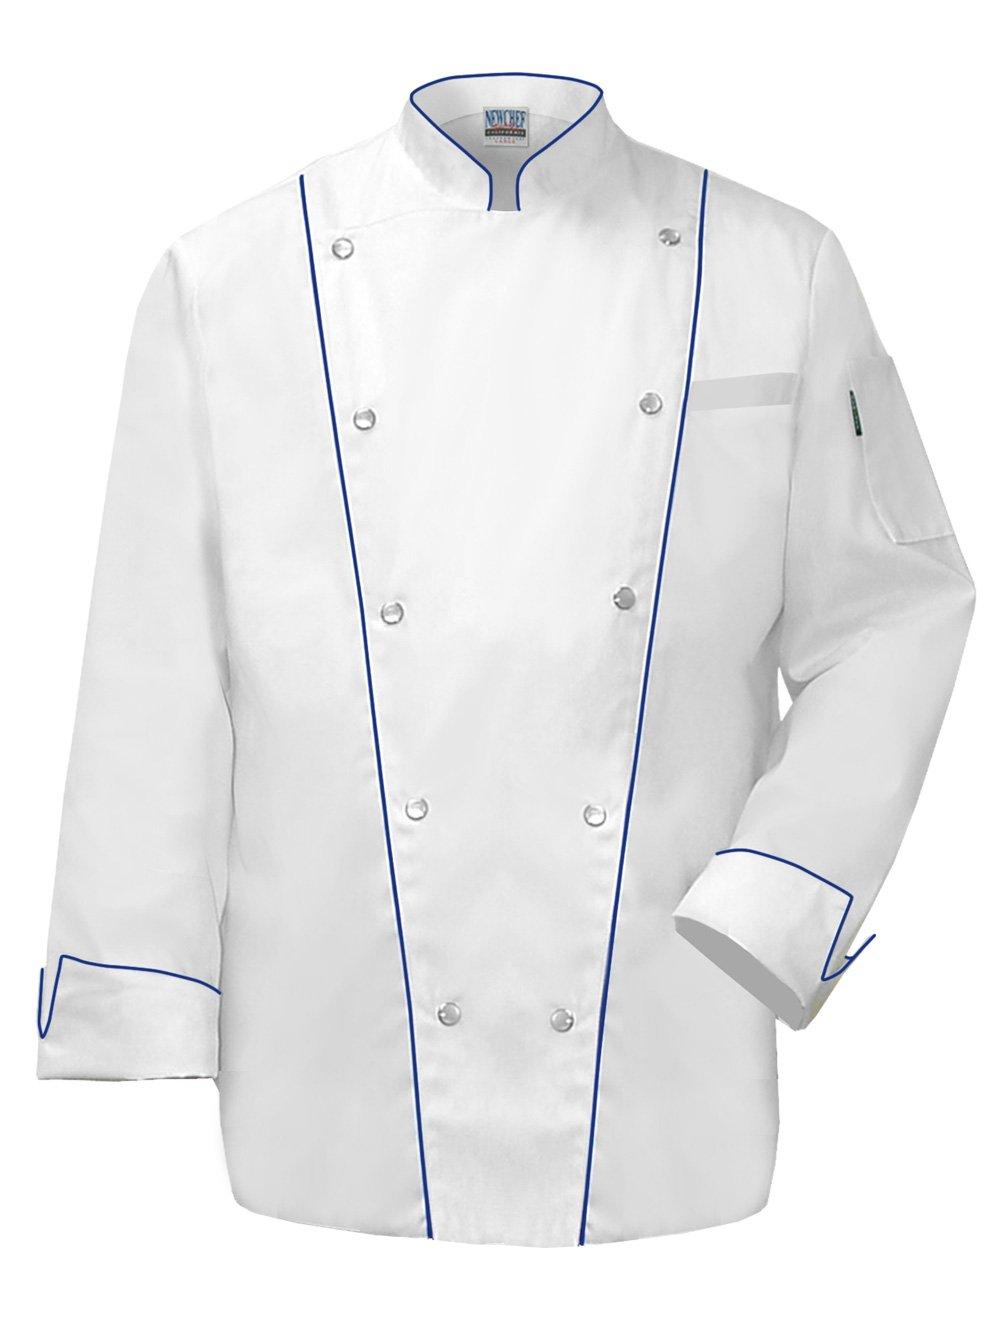 Newchef Fashion Royal Chef Coat Royal Blue Trim 2XL White